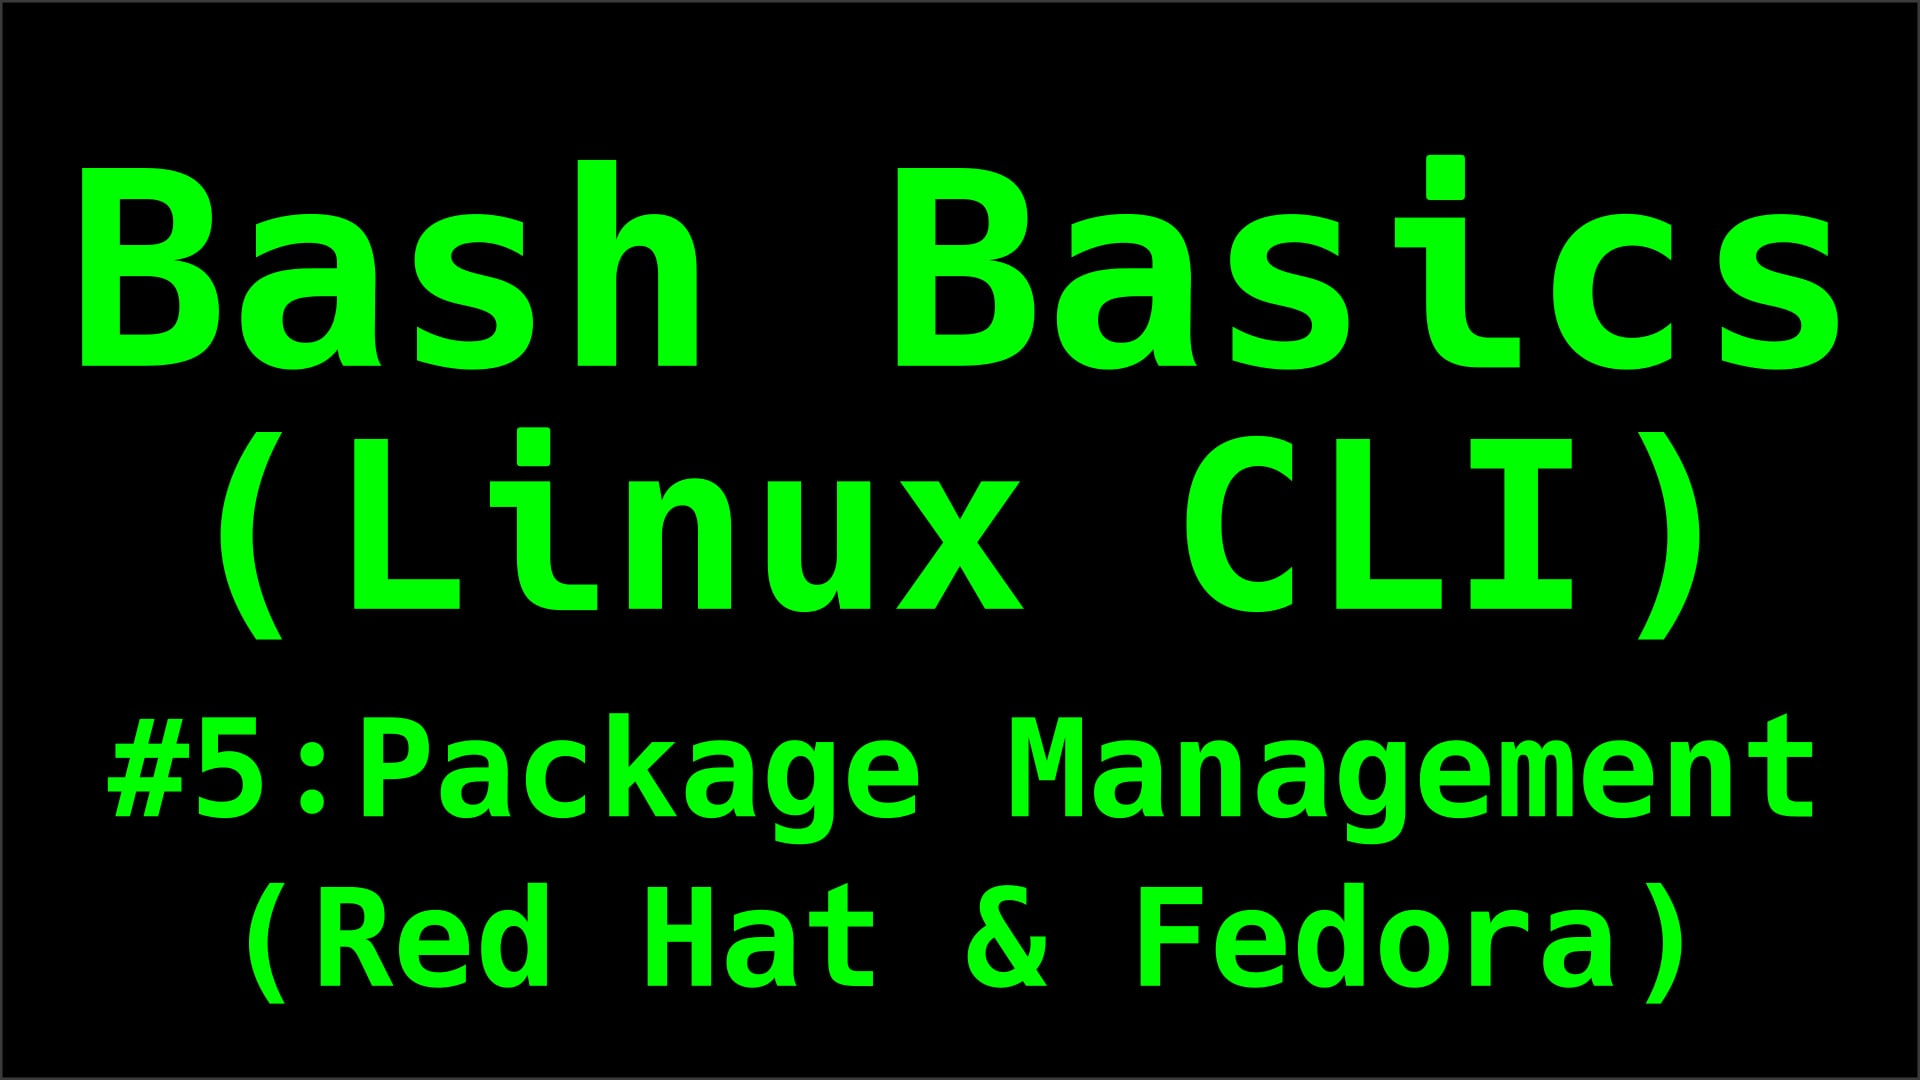 Package Management (Red Hat & Fedora) - Bash Basics (Linux CLI)